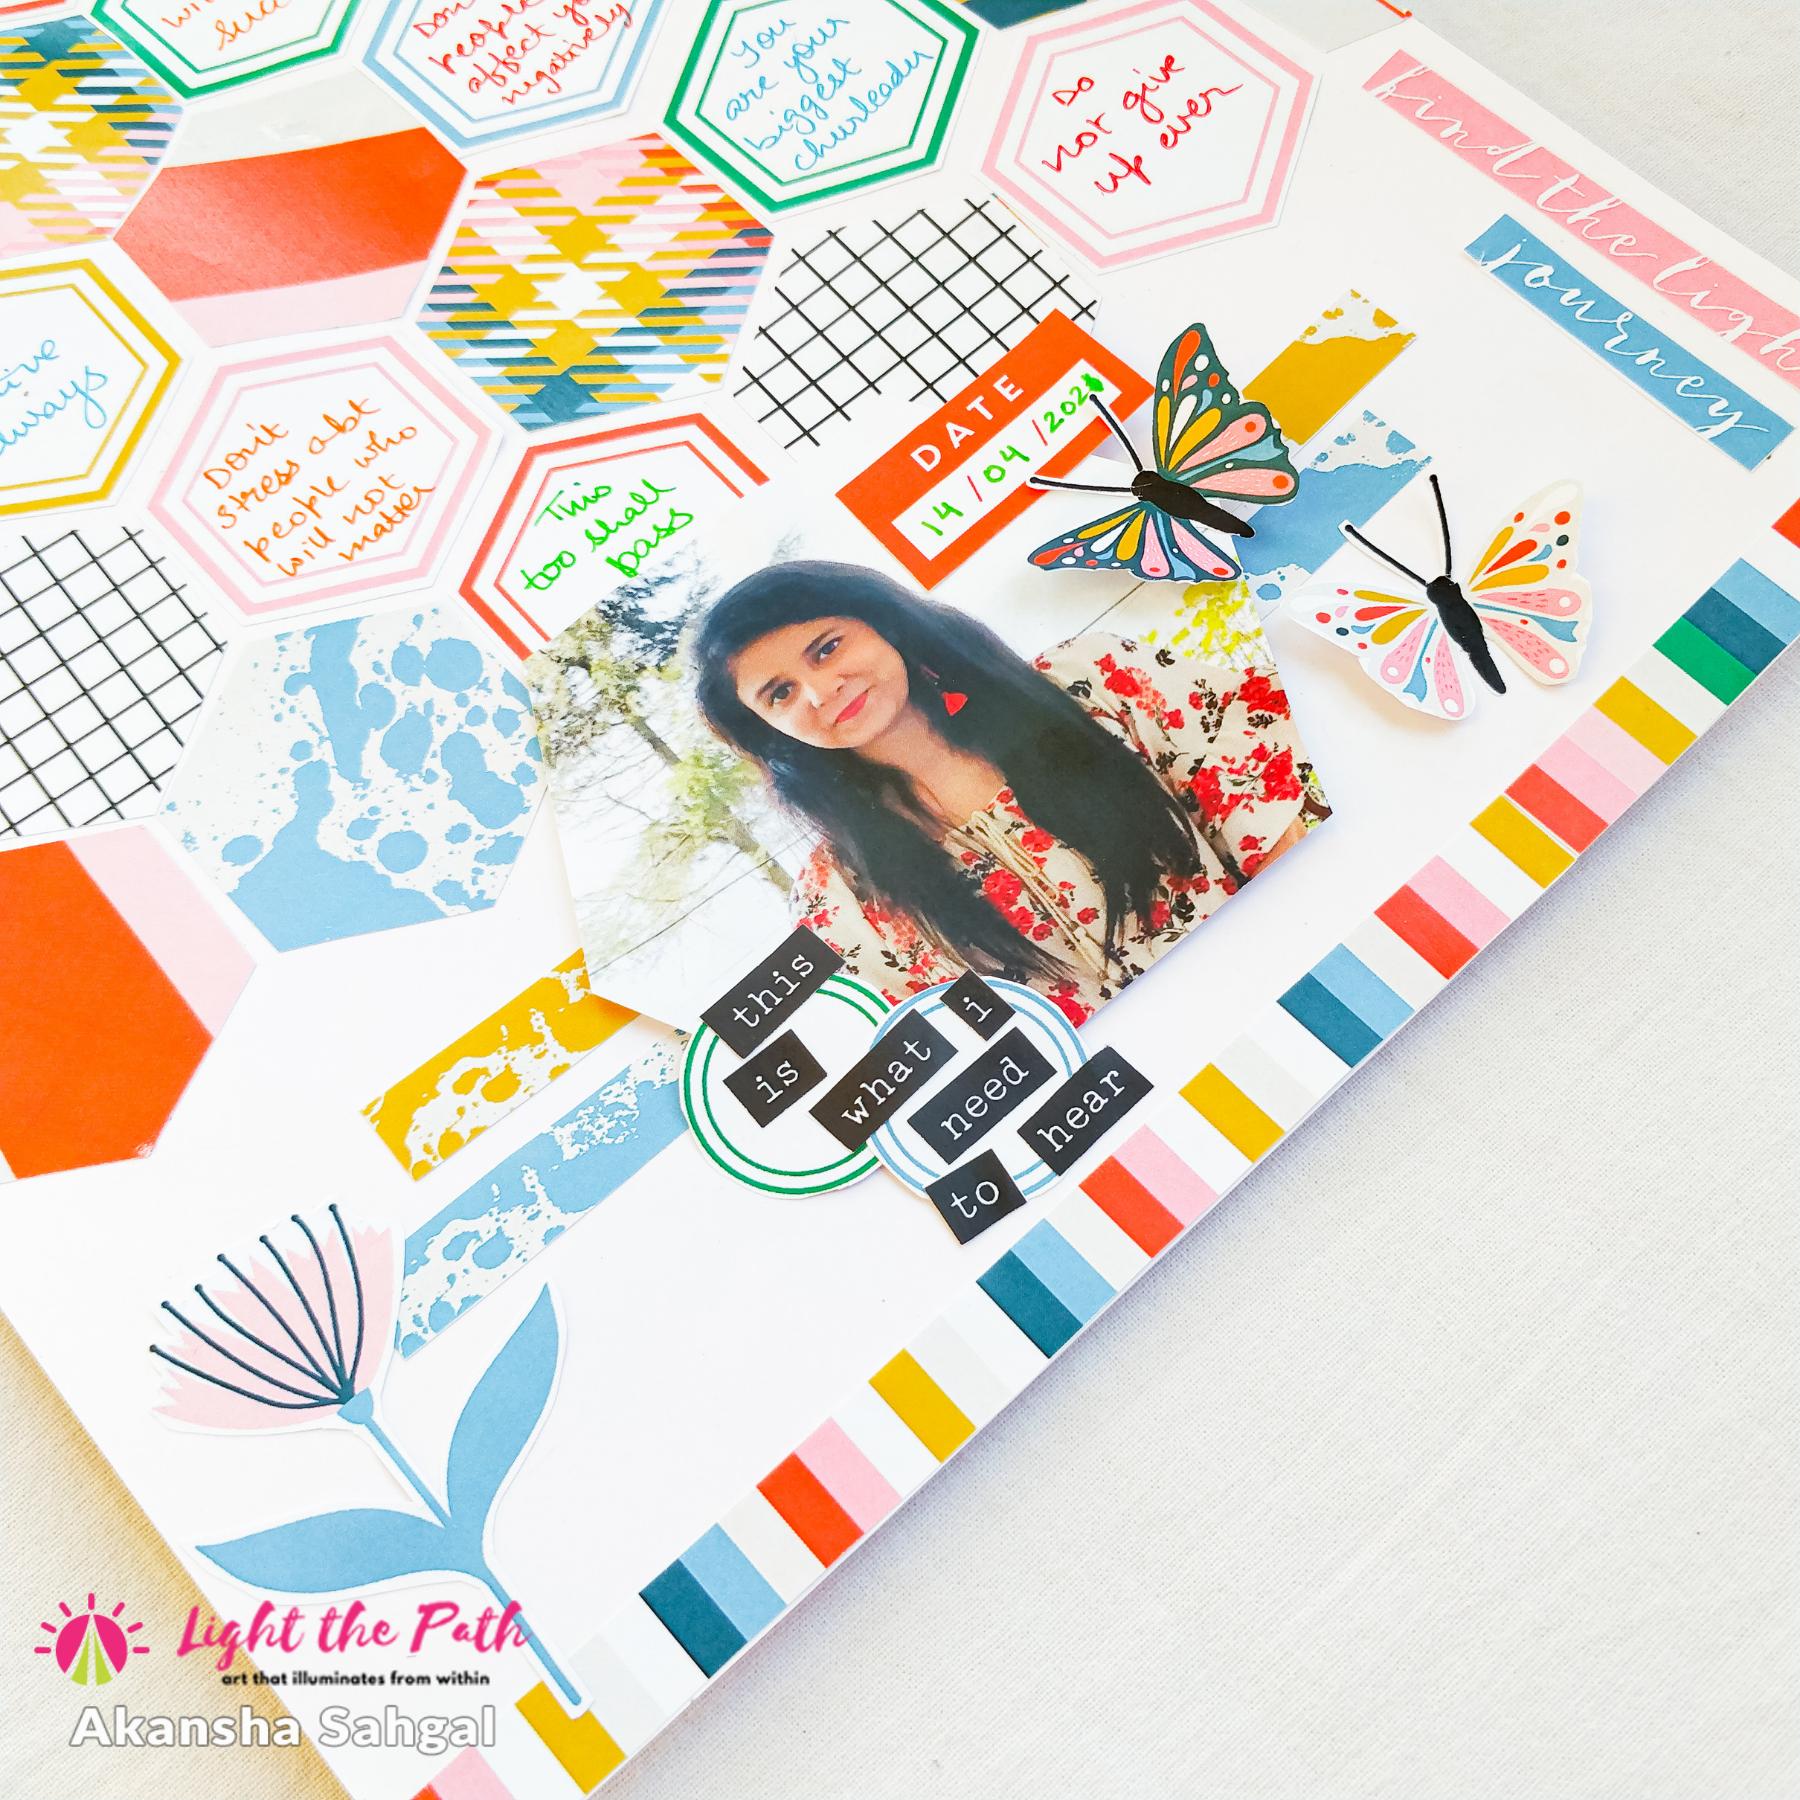 Light The Path Design Team- Akansha Sahgal   May 2021 Things I want to hear